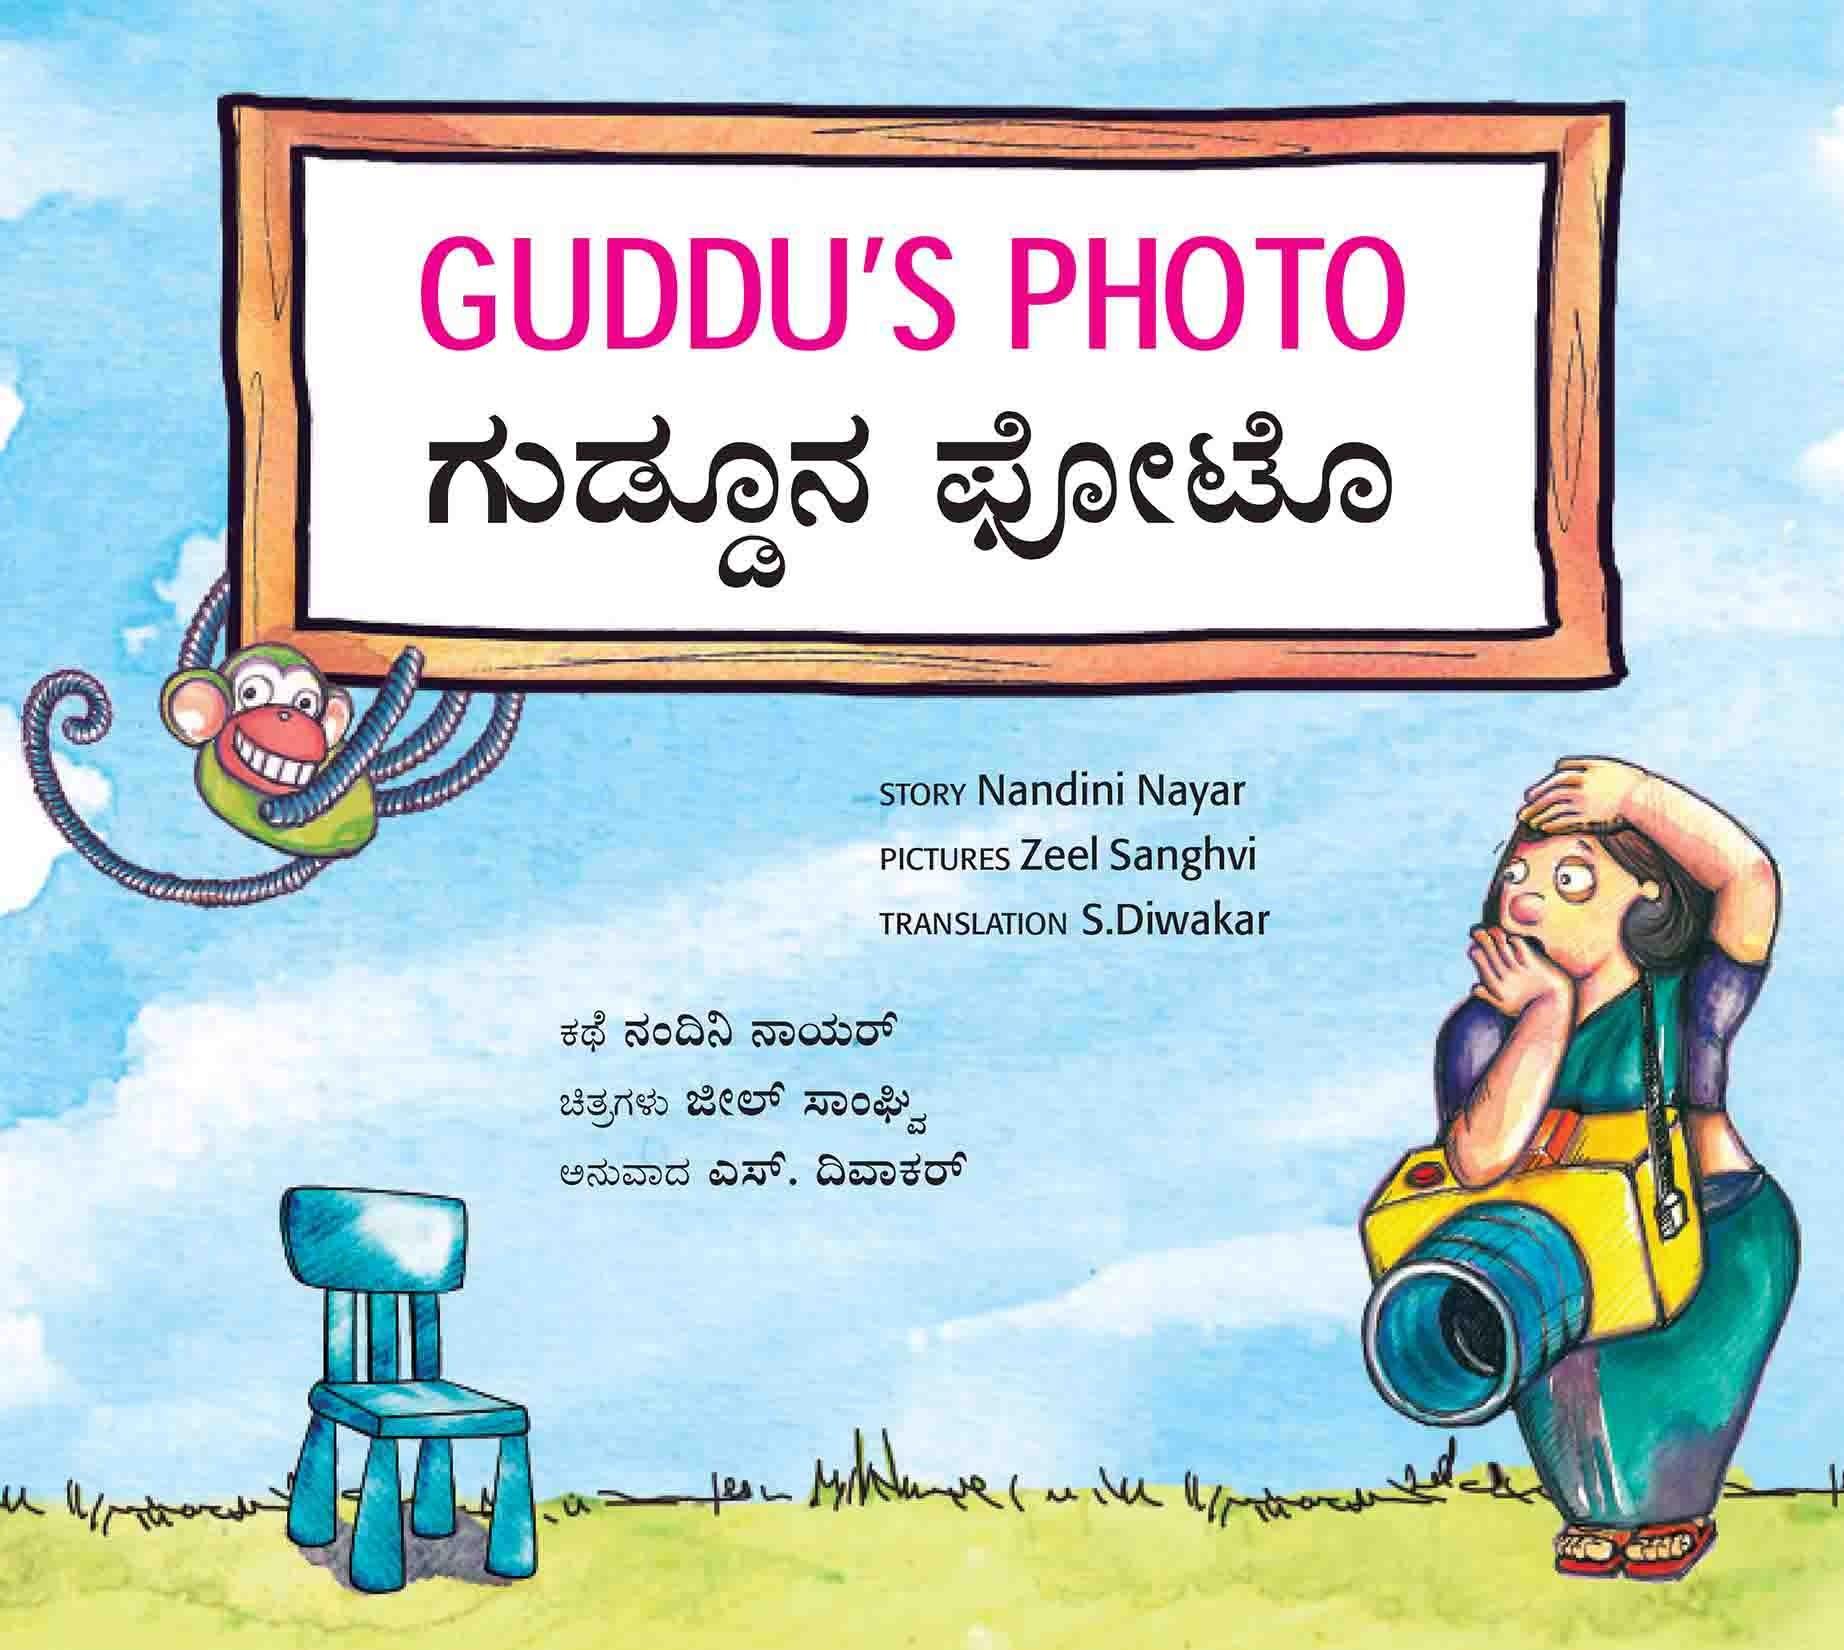 Guddu's Photo/Guddoona Photo (English-Kannada)